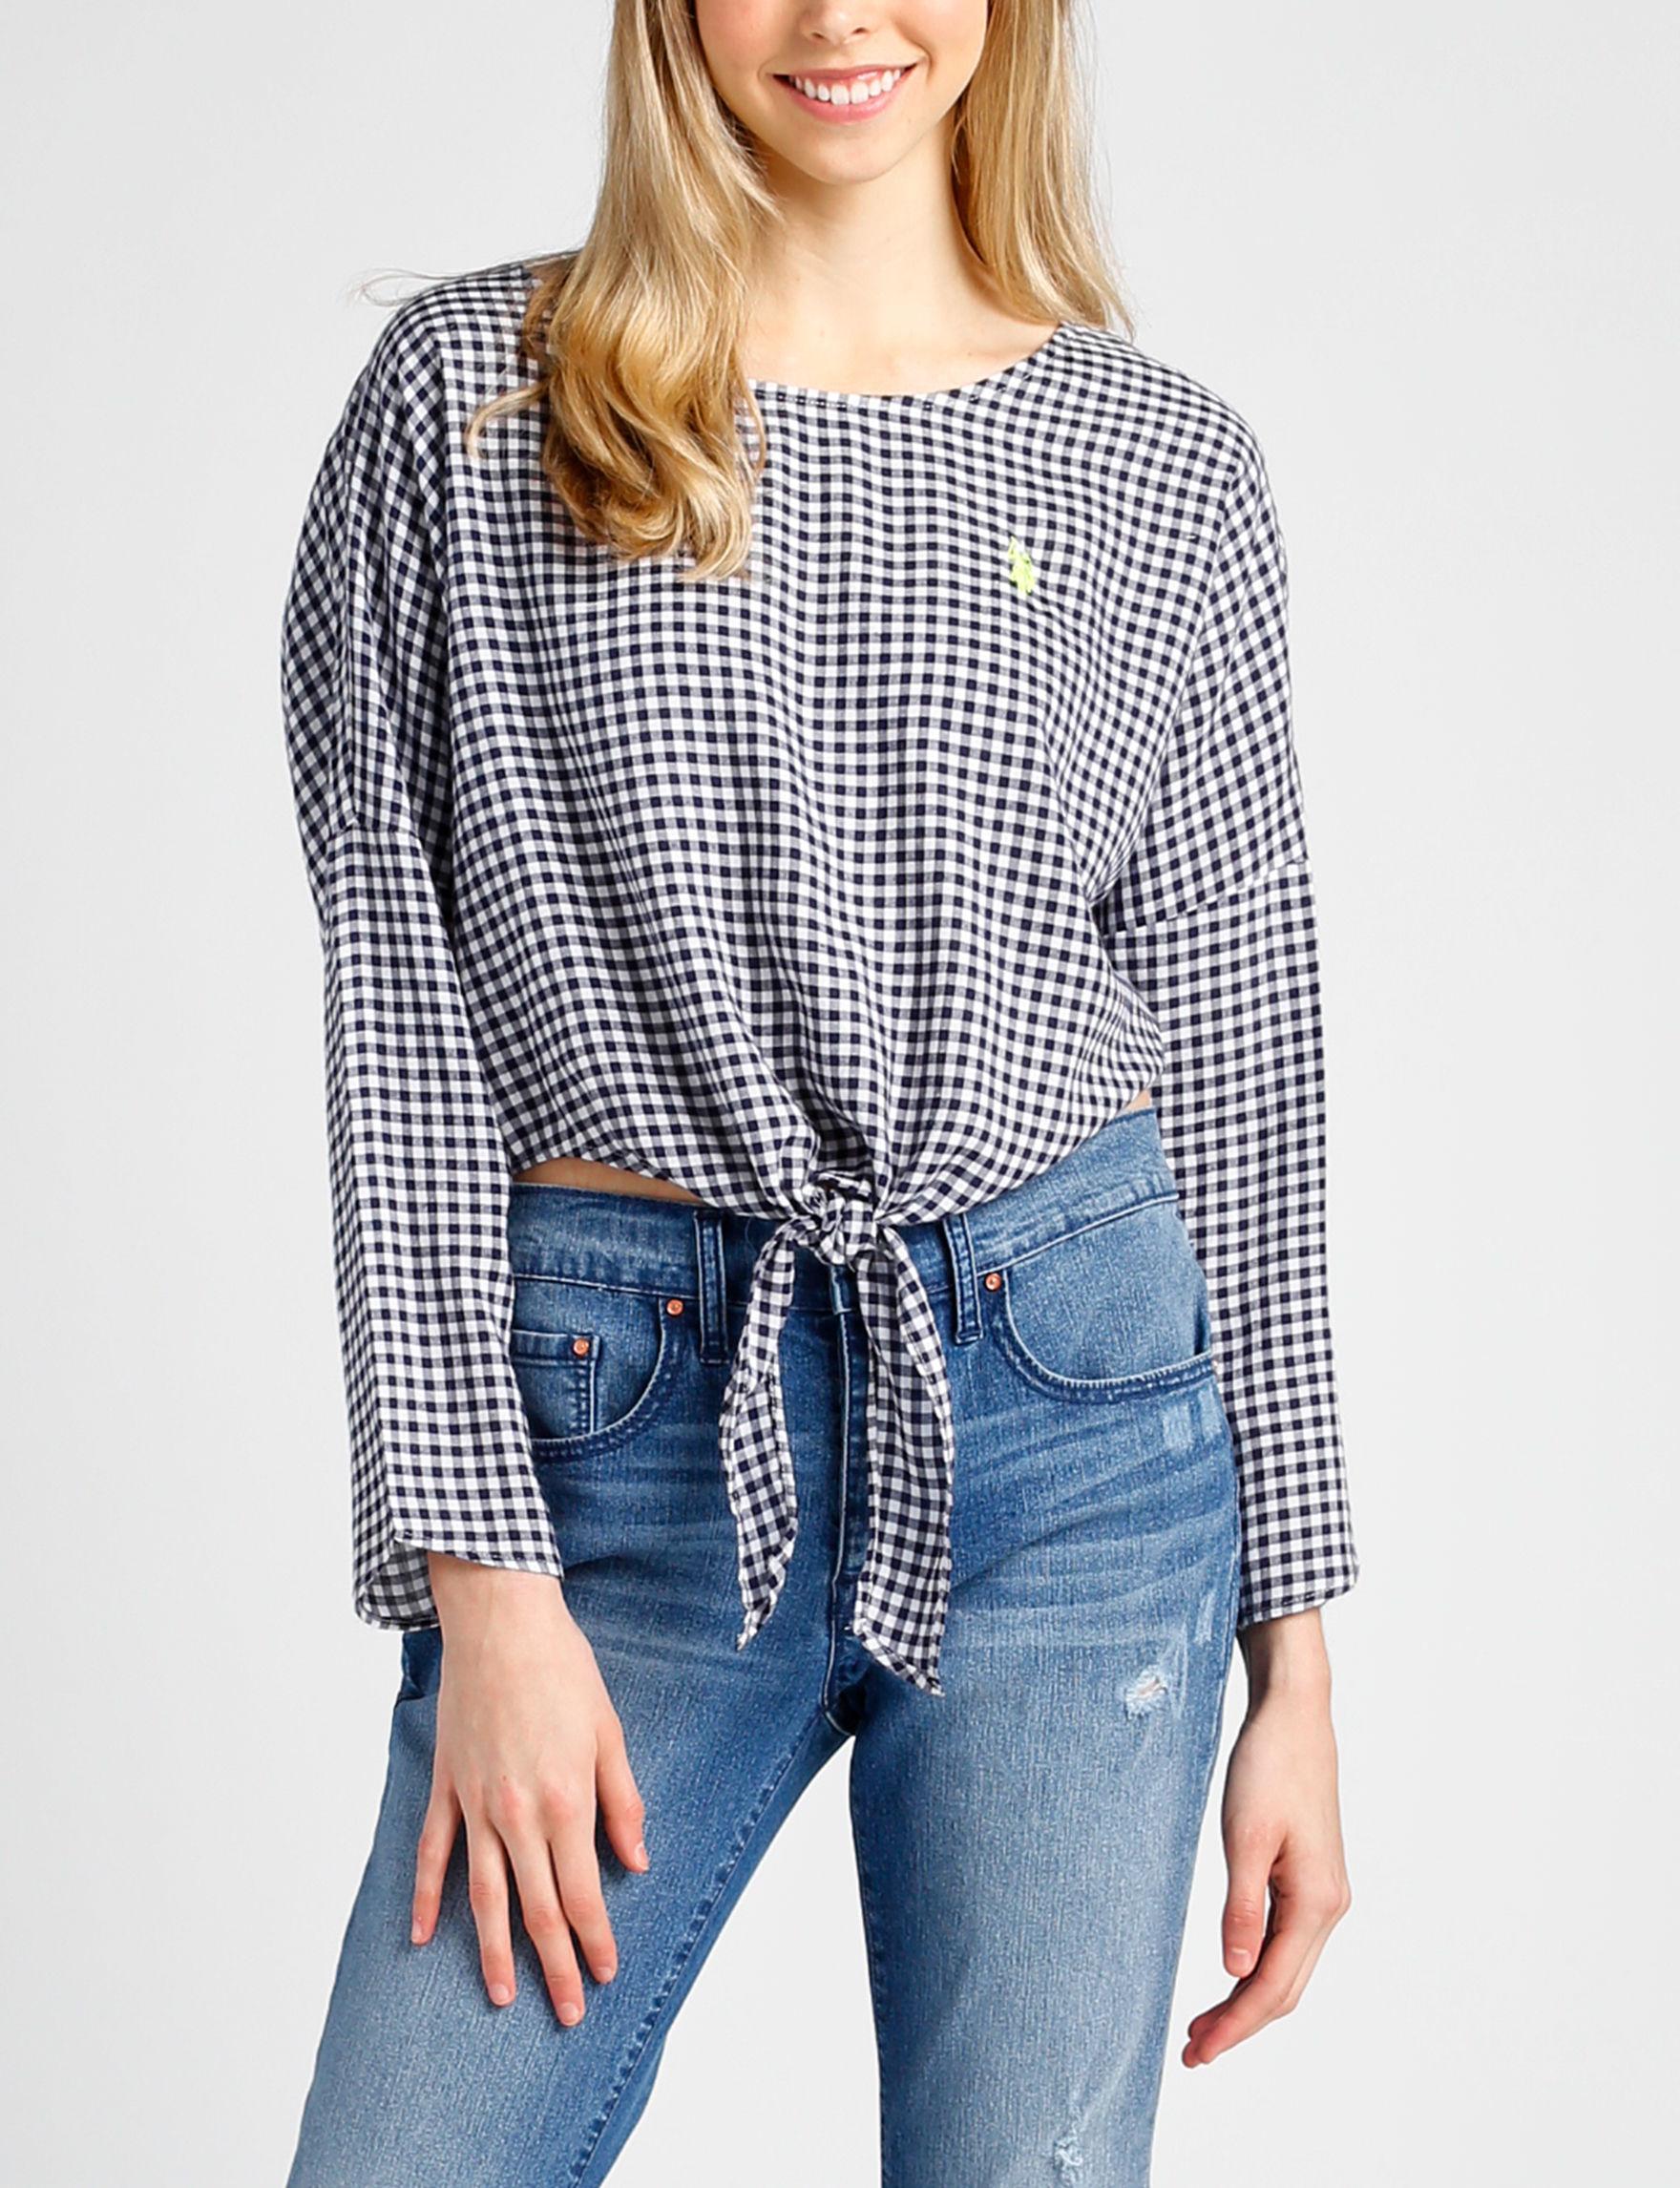 U.S. Polo Assn. Blue / White Shirts & Blouses